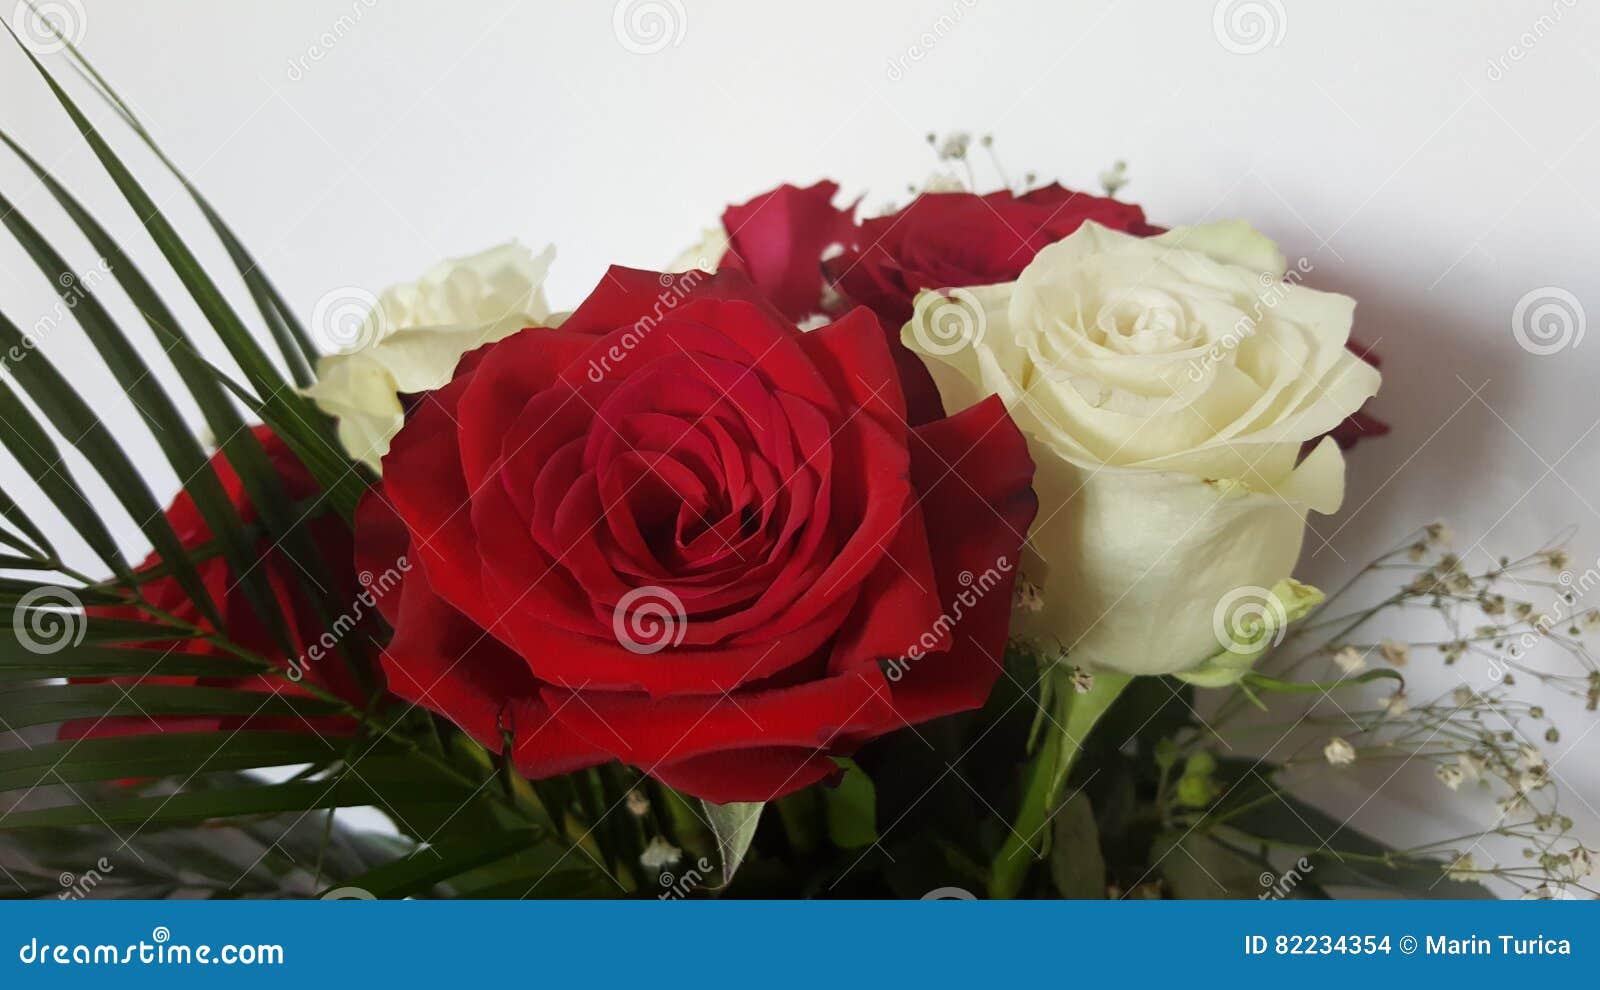 White and red roses beautiful flowers stock photo image of flower download white and red roses beautiful flowers stock photo image of flower pattern izmirmasajfo